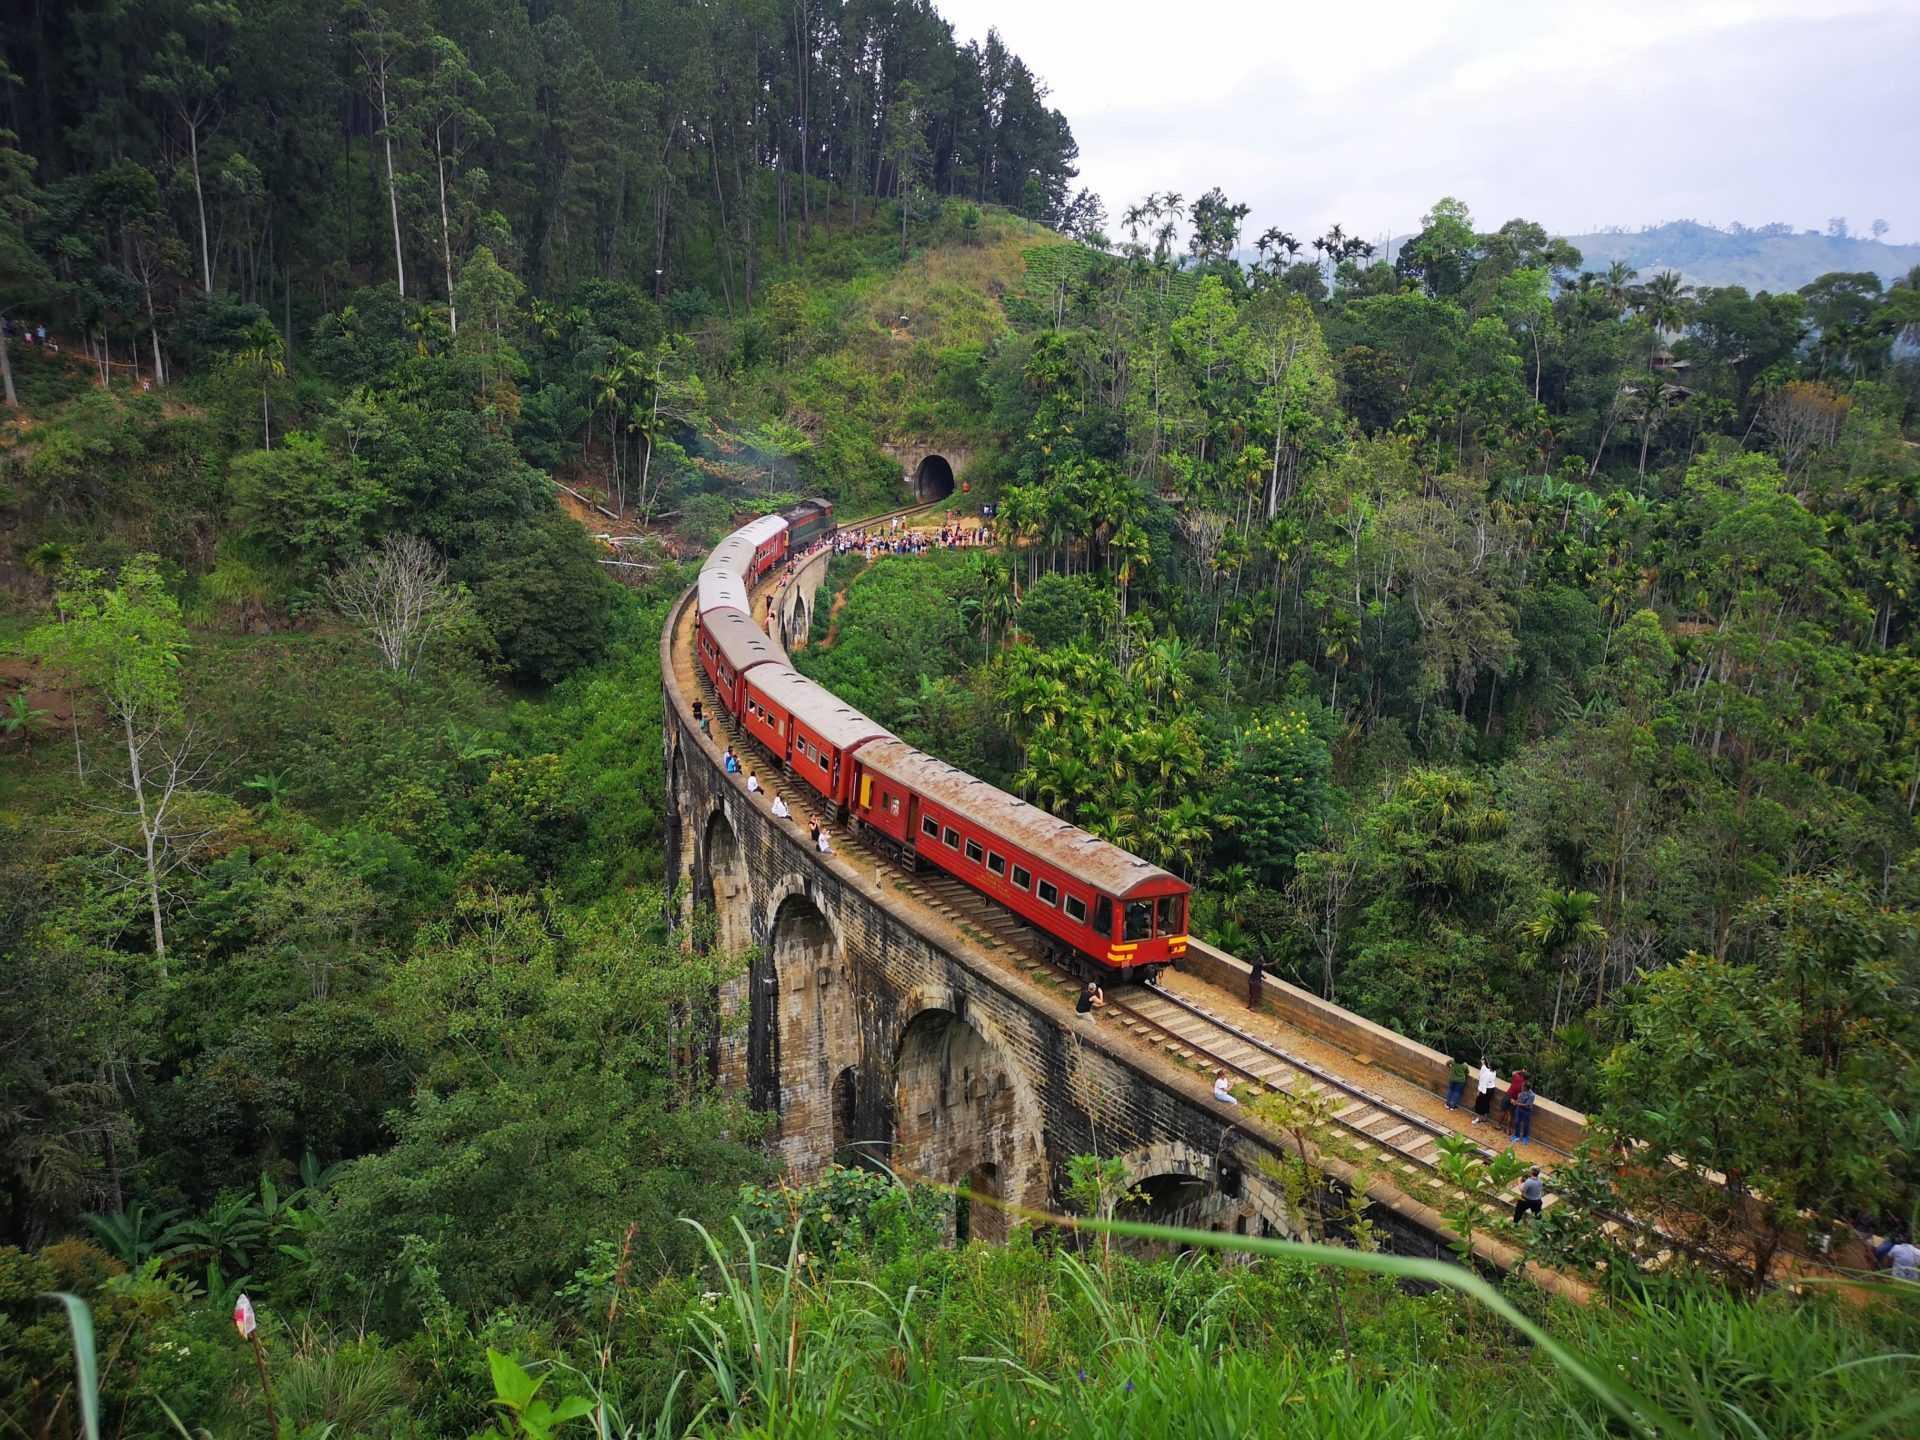 Train ride from Pattipola through the tea plantations to Ella